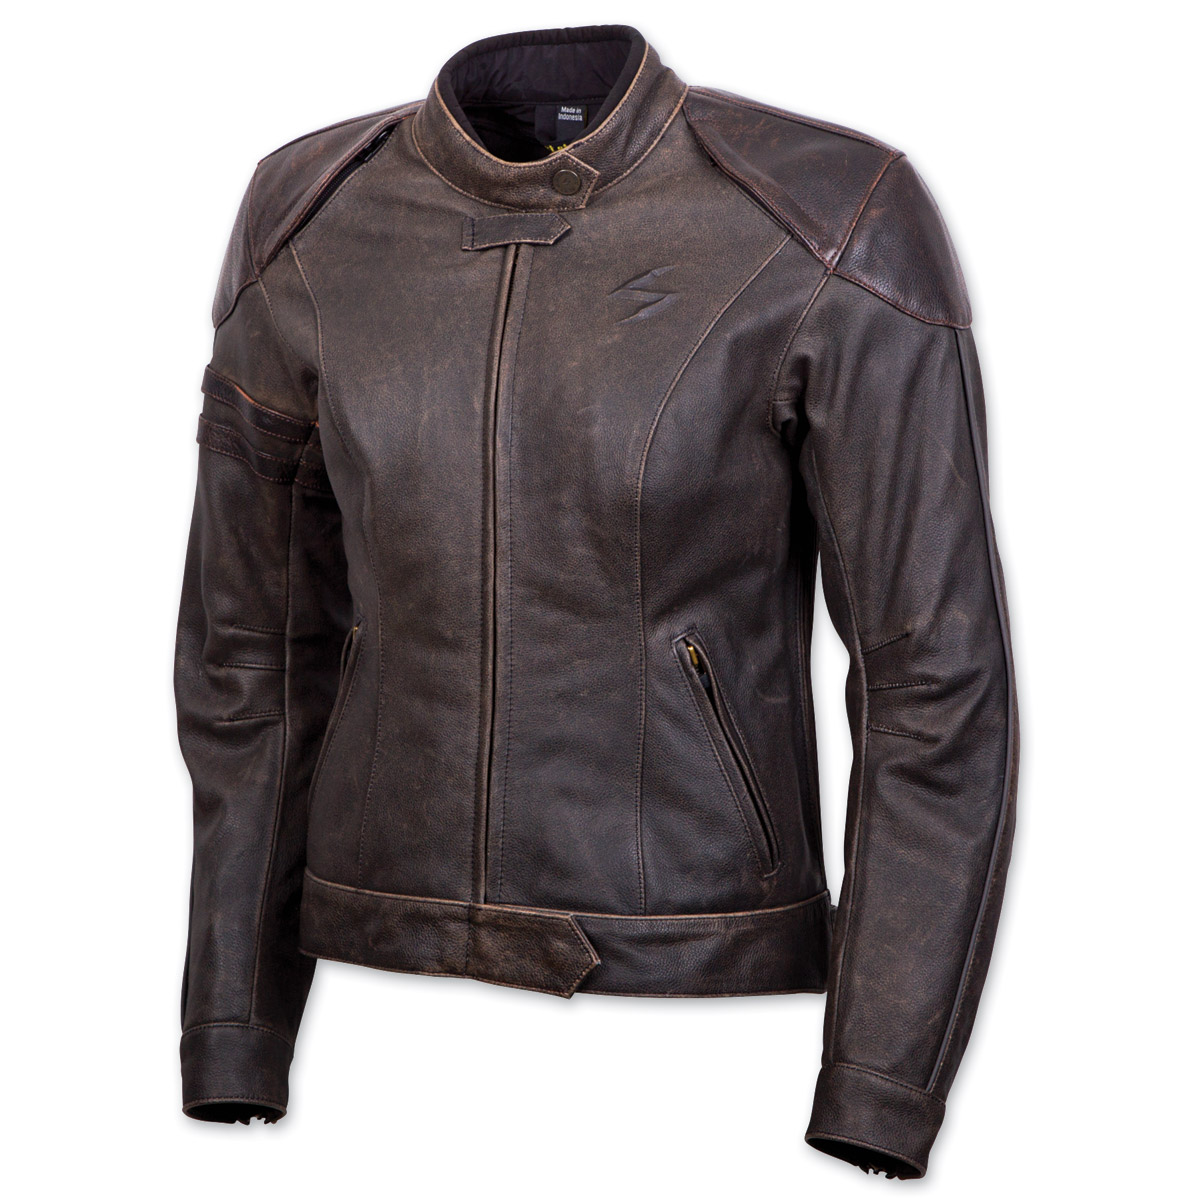 Scorpion EXO Women's Catalina Brown Leather Jacket